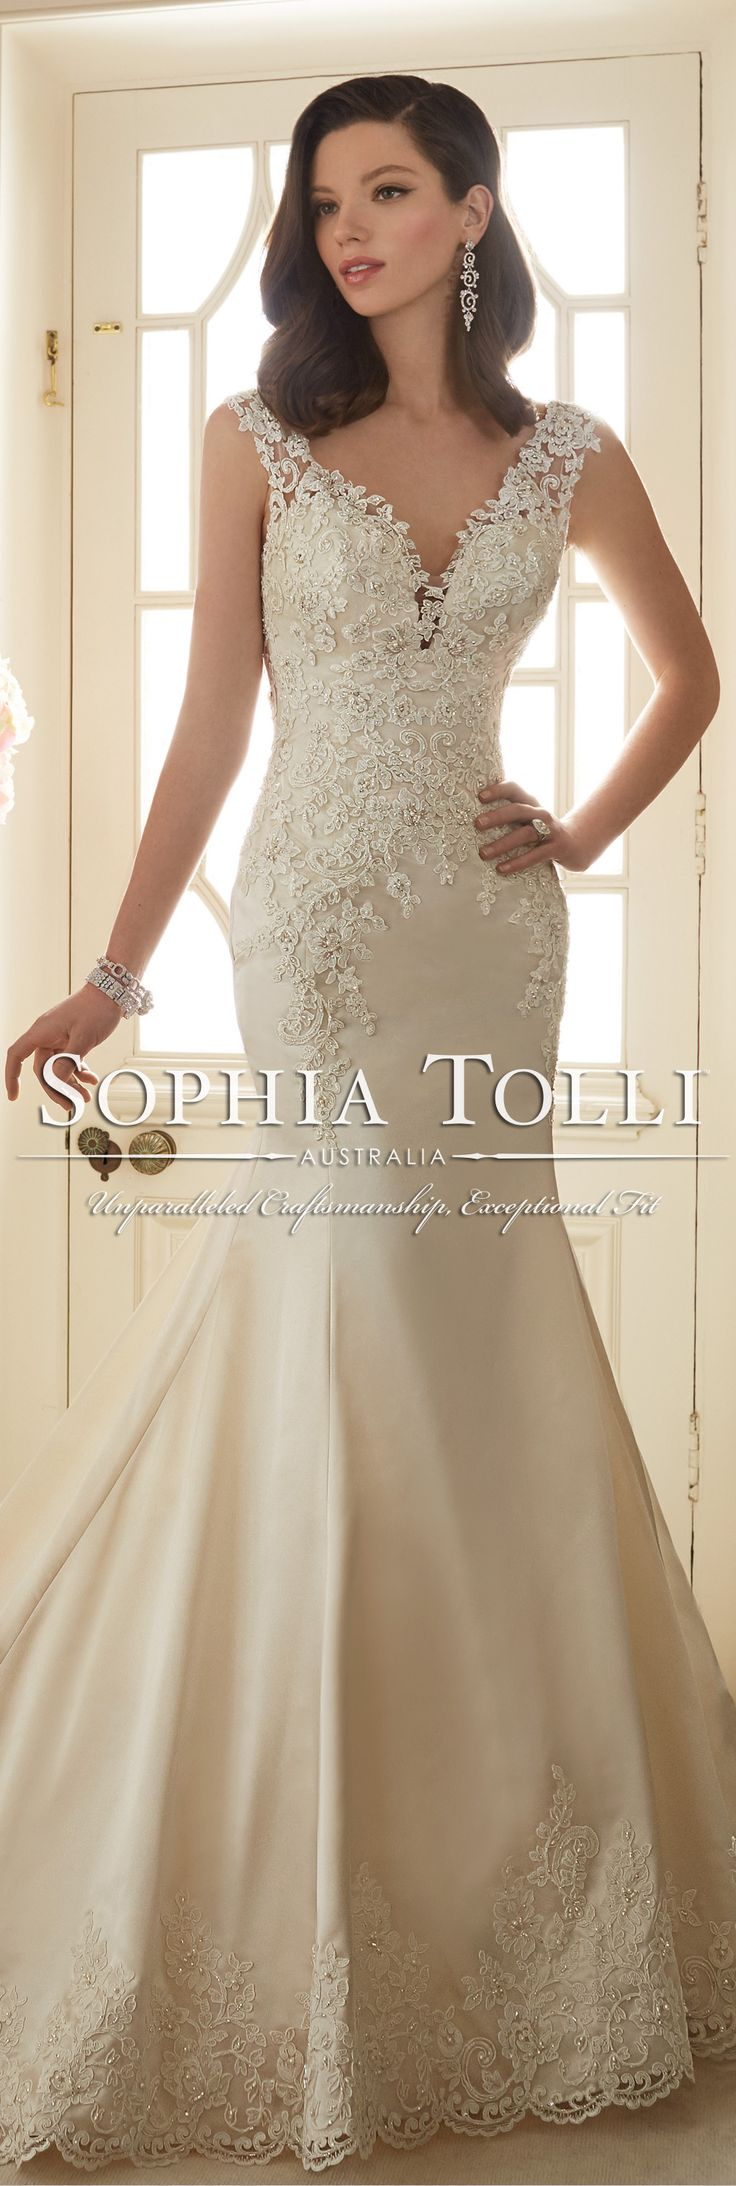 Tea length wedding dress patterns to sew   best Wedding dresses images on Pinterest